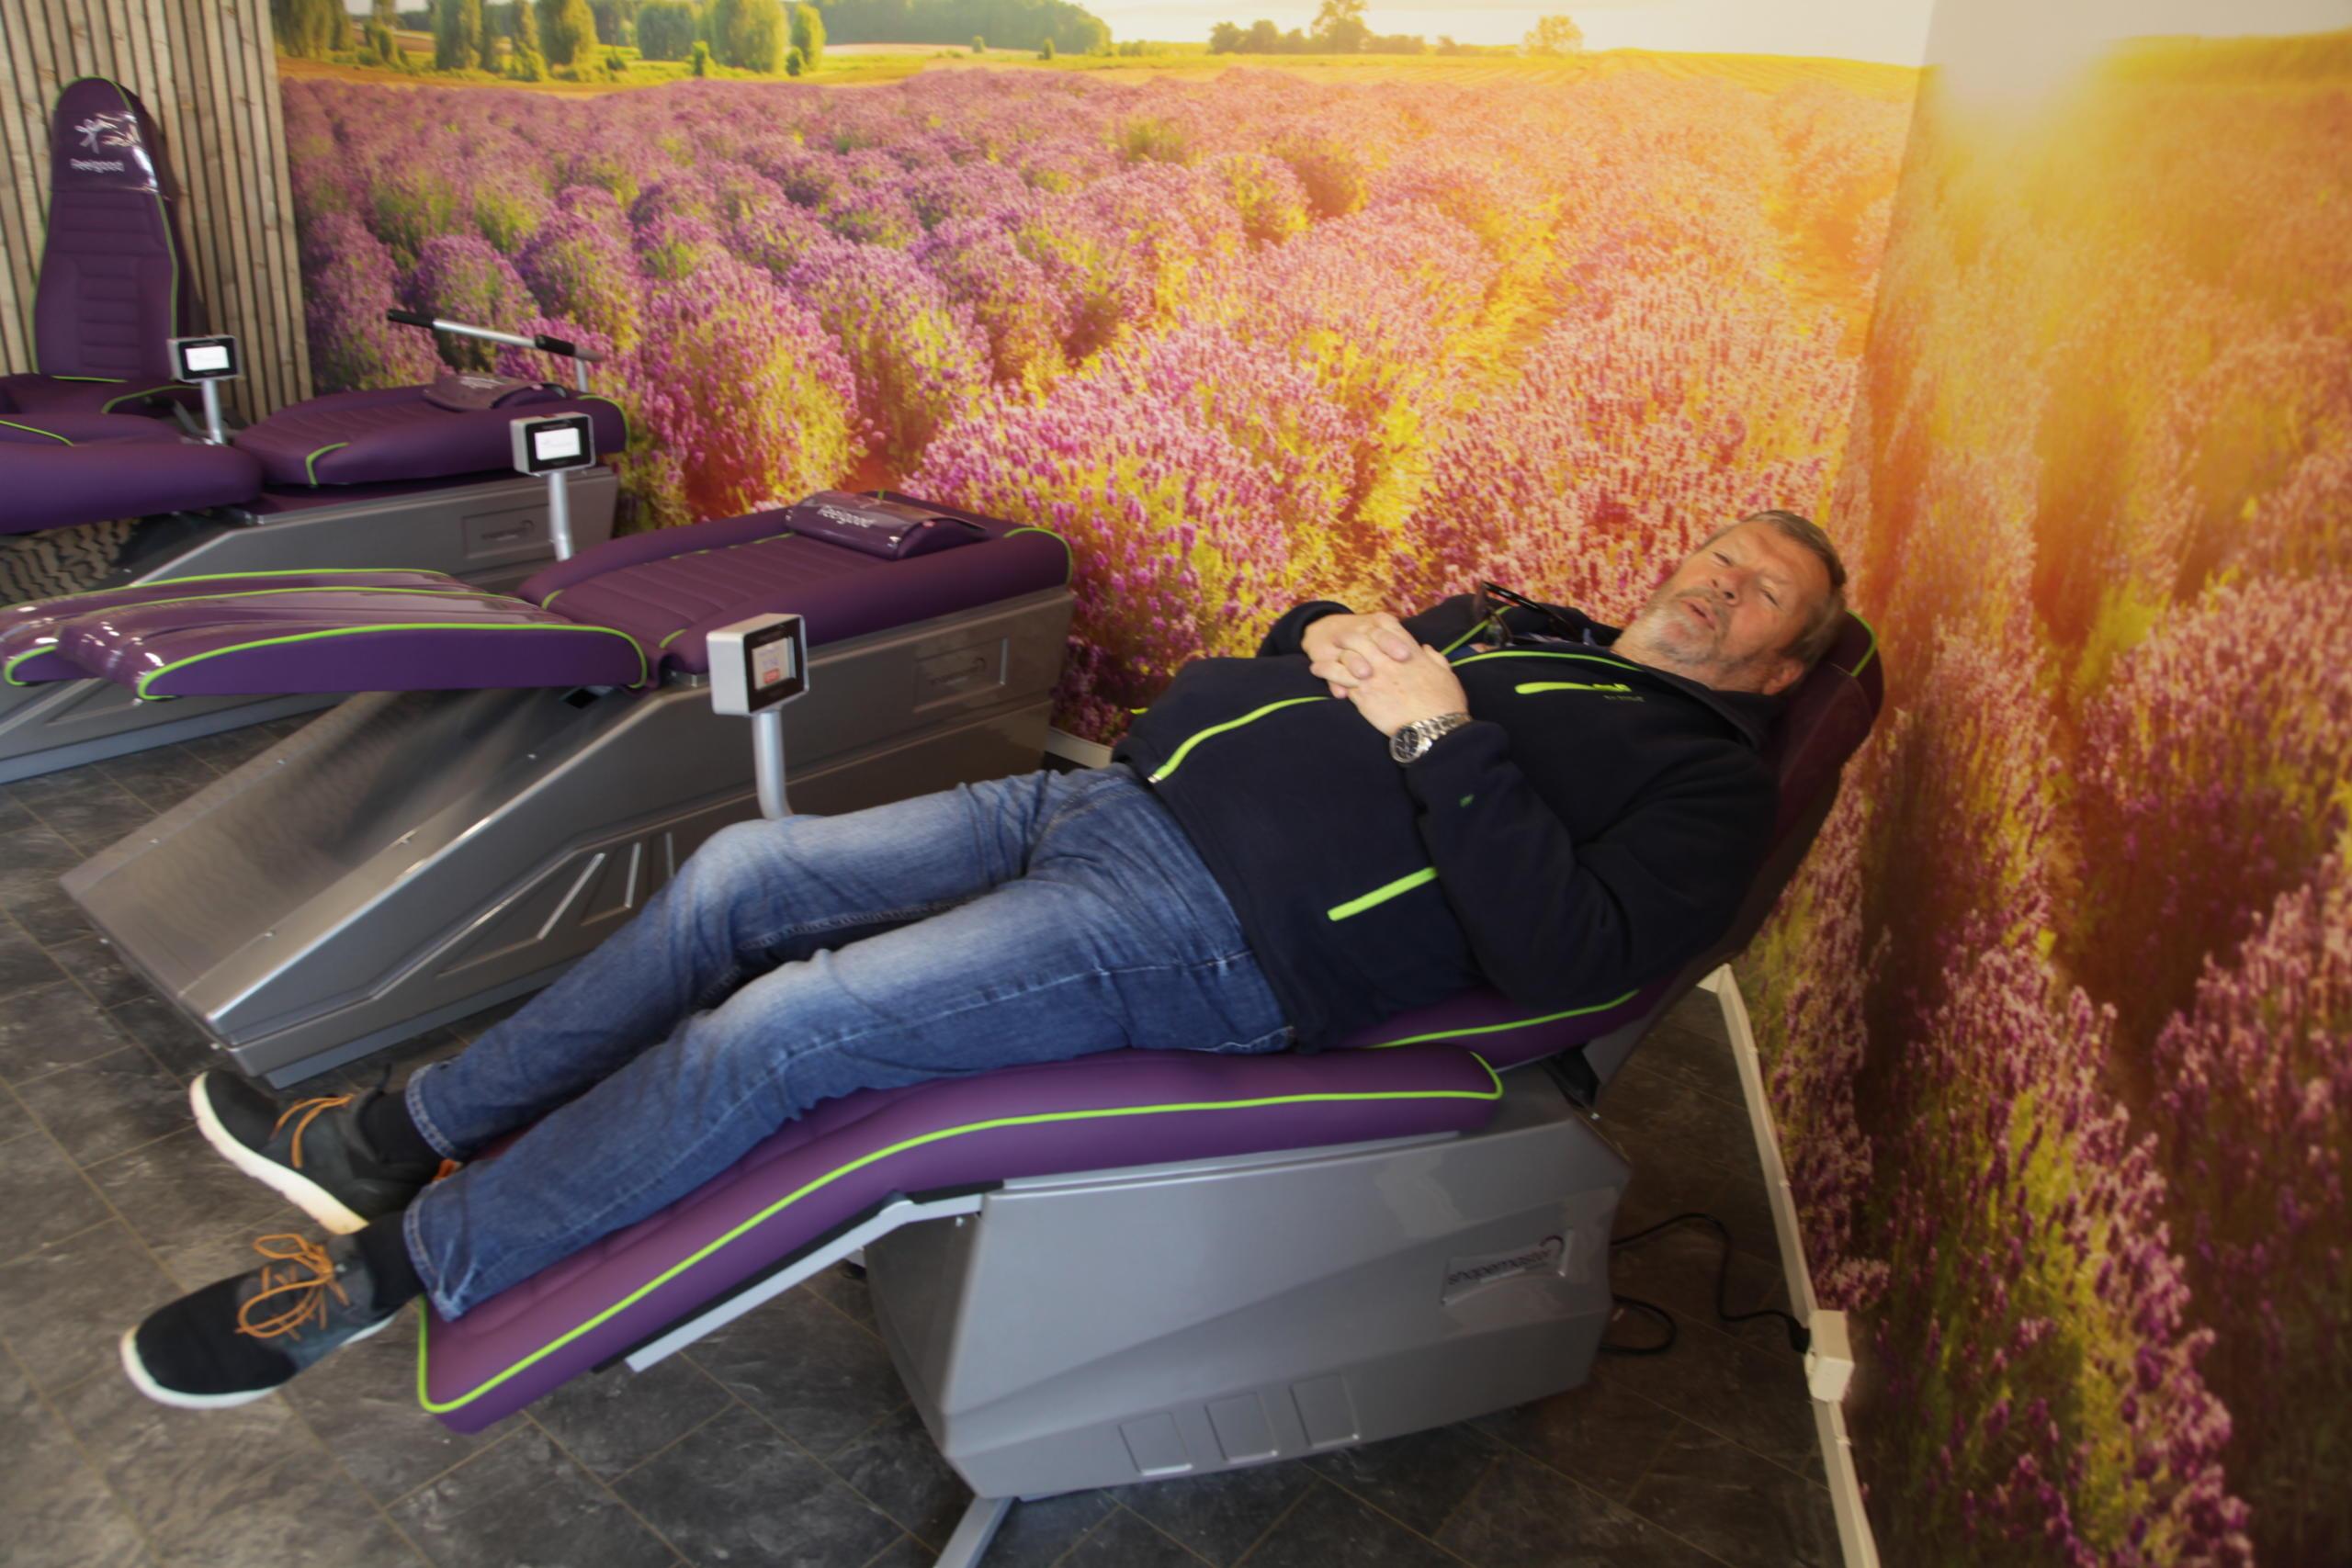 Ordføreren ligger i en Feelgood stol-seng